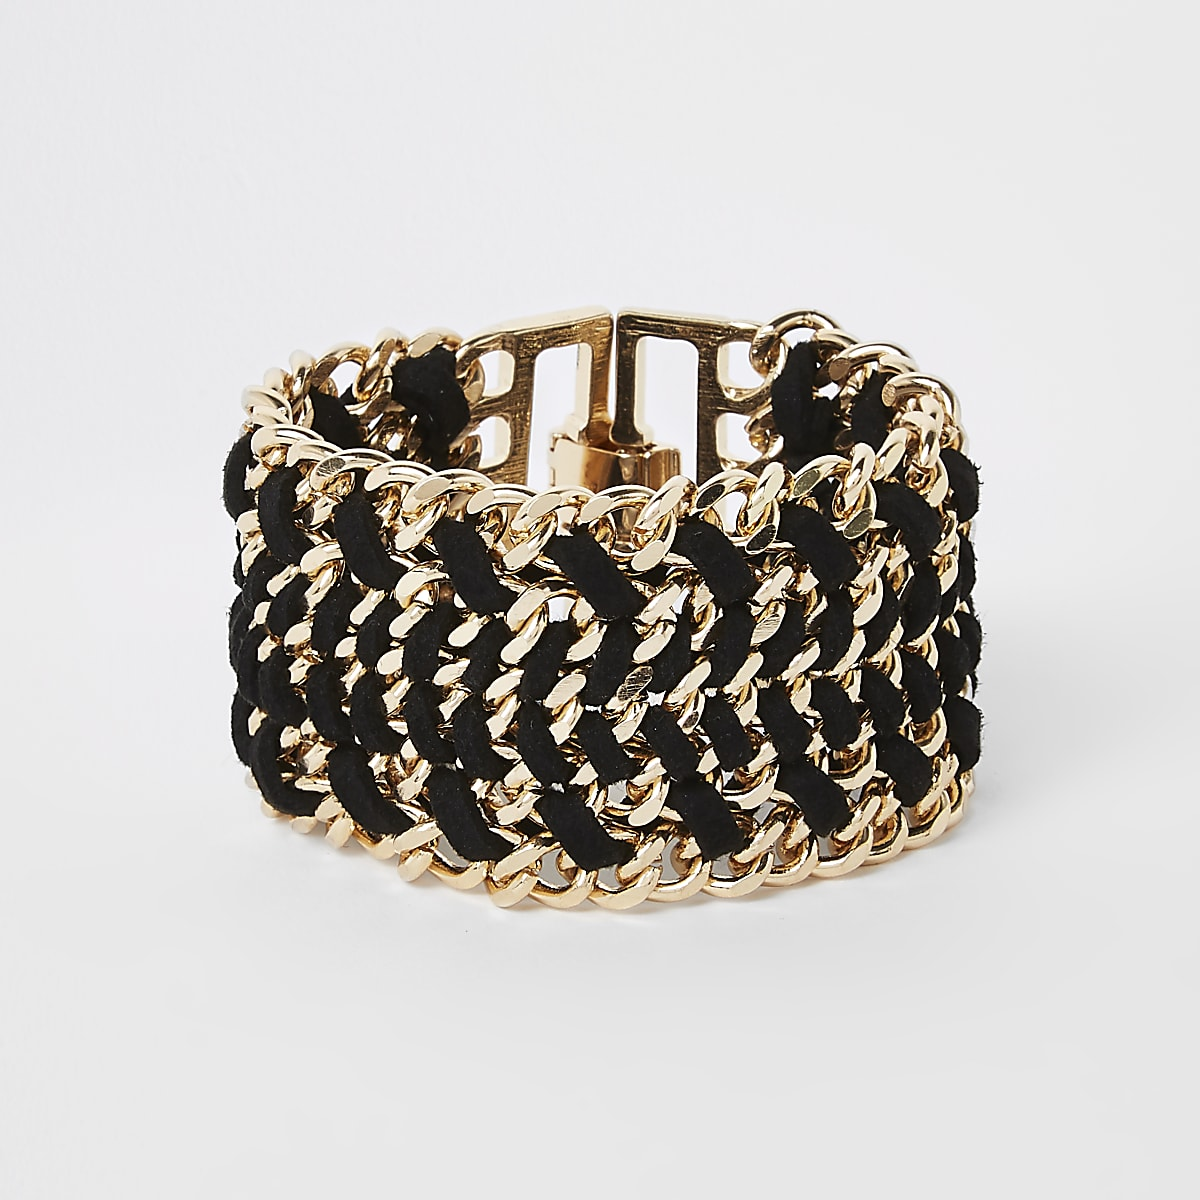 Gold color black thread clasp bracelet